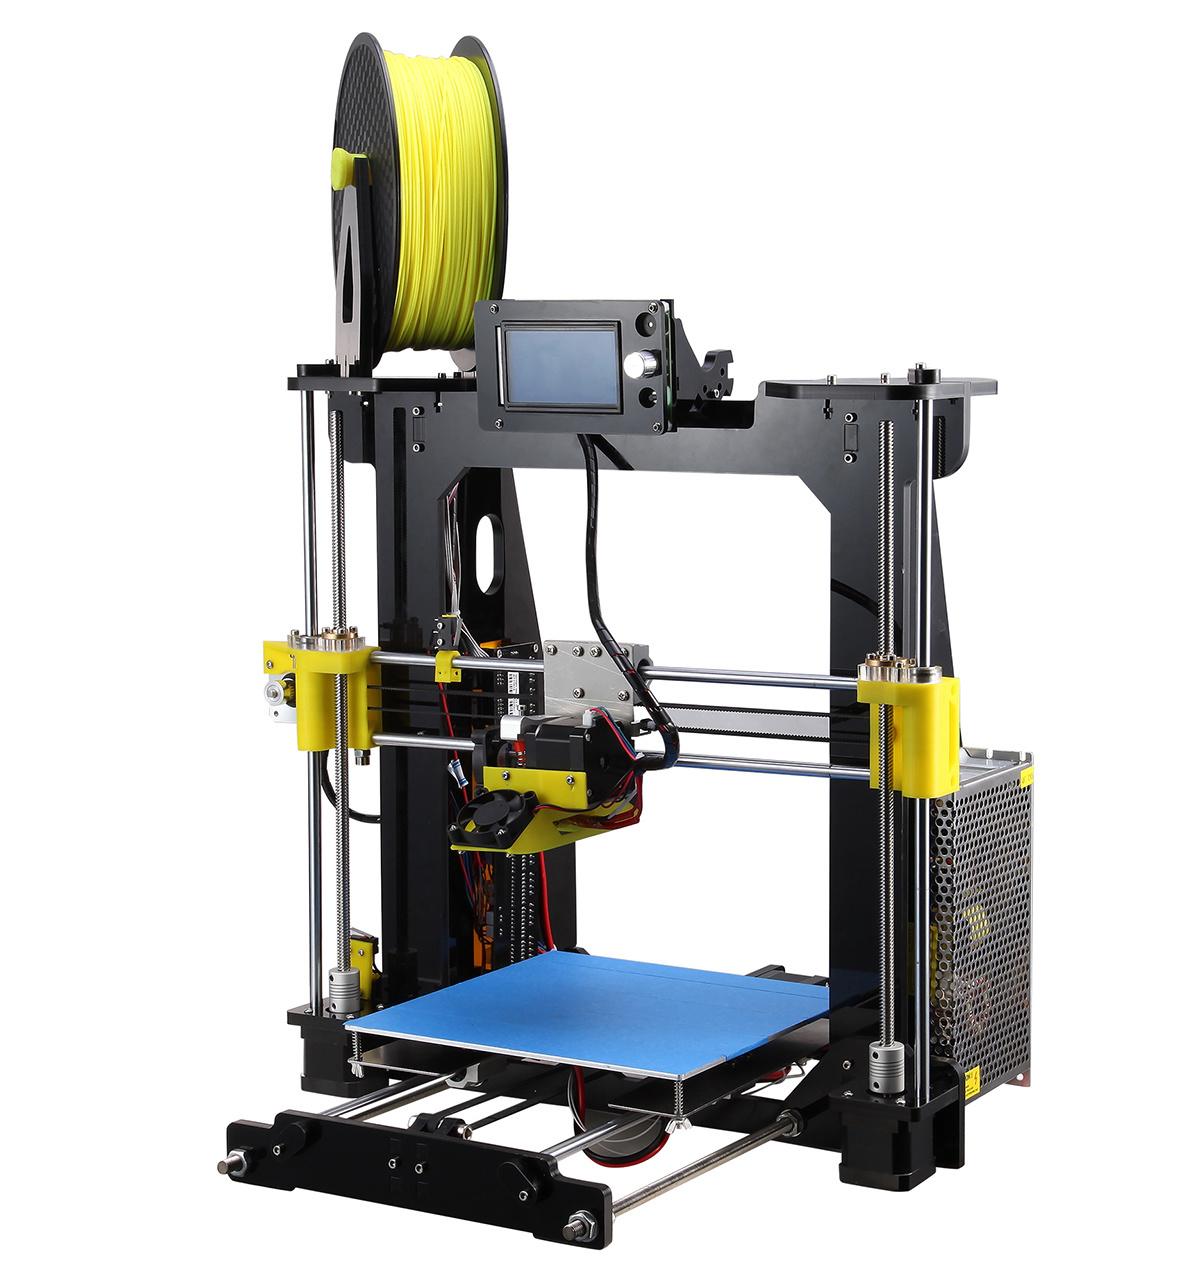 Hot Sale Durable Acrylic Rapid Prototype DIY Desktop 3D Printer